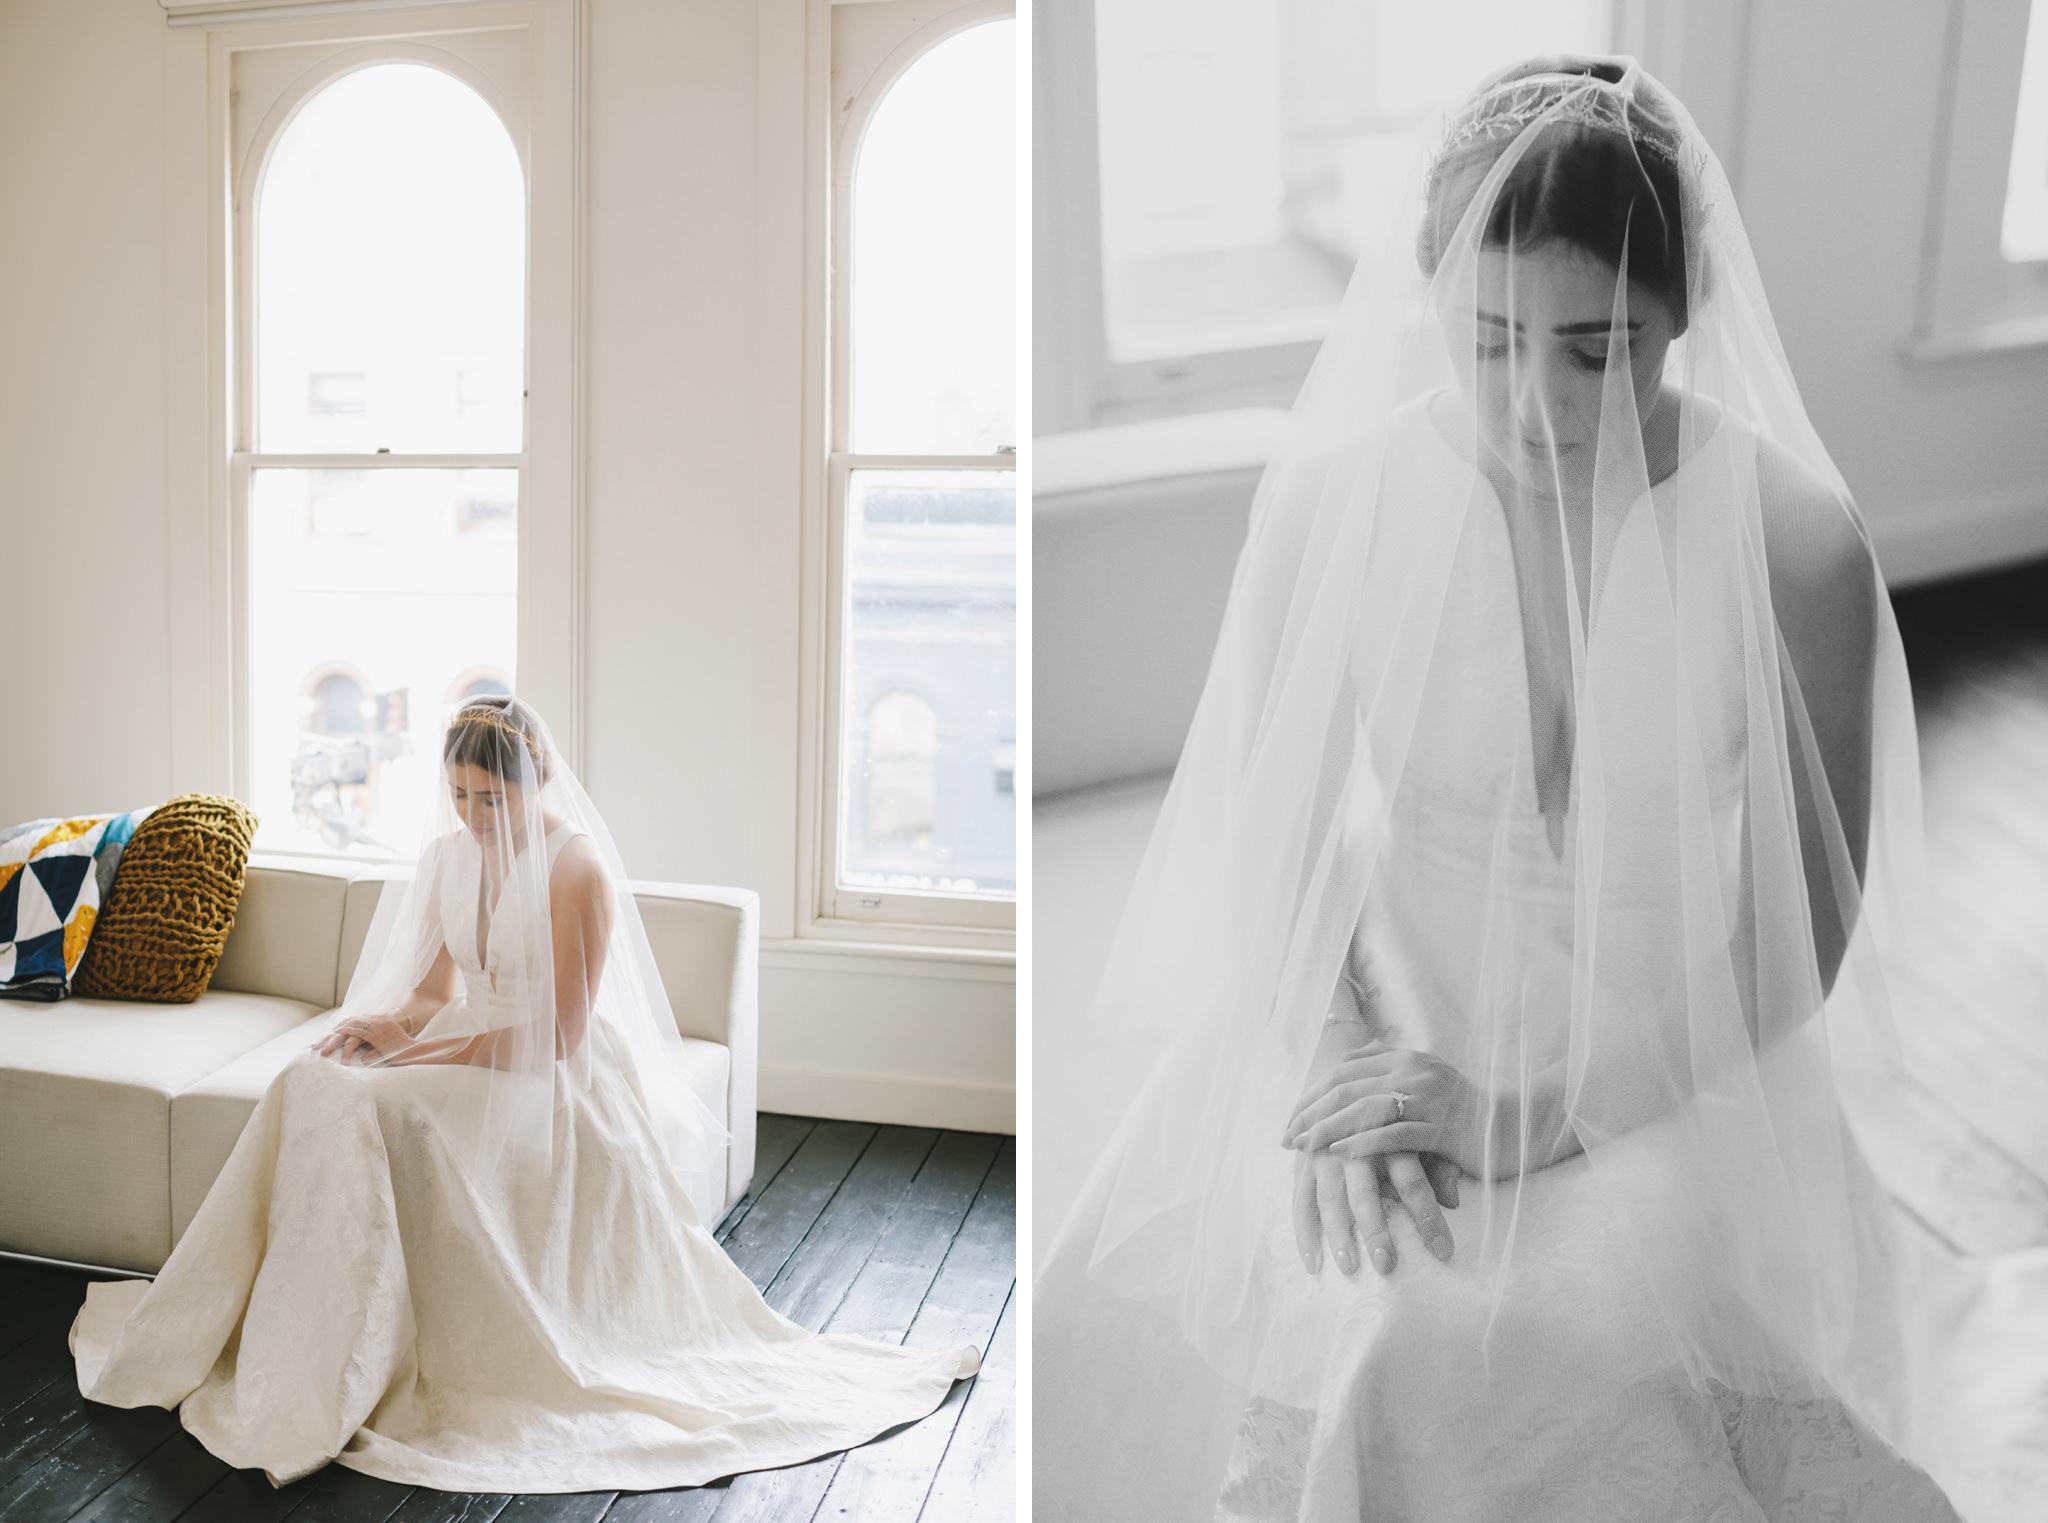 Abbotsford_Convent_Wedding_Peter_Anna035.JPG